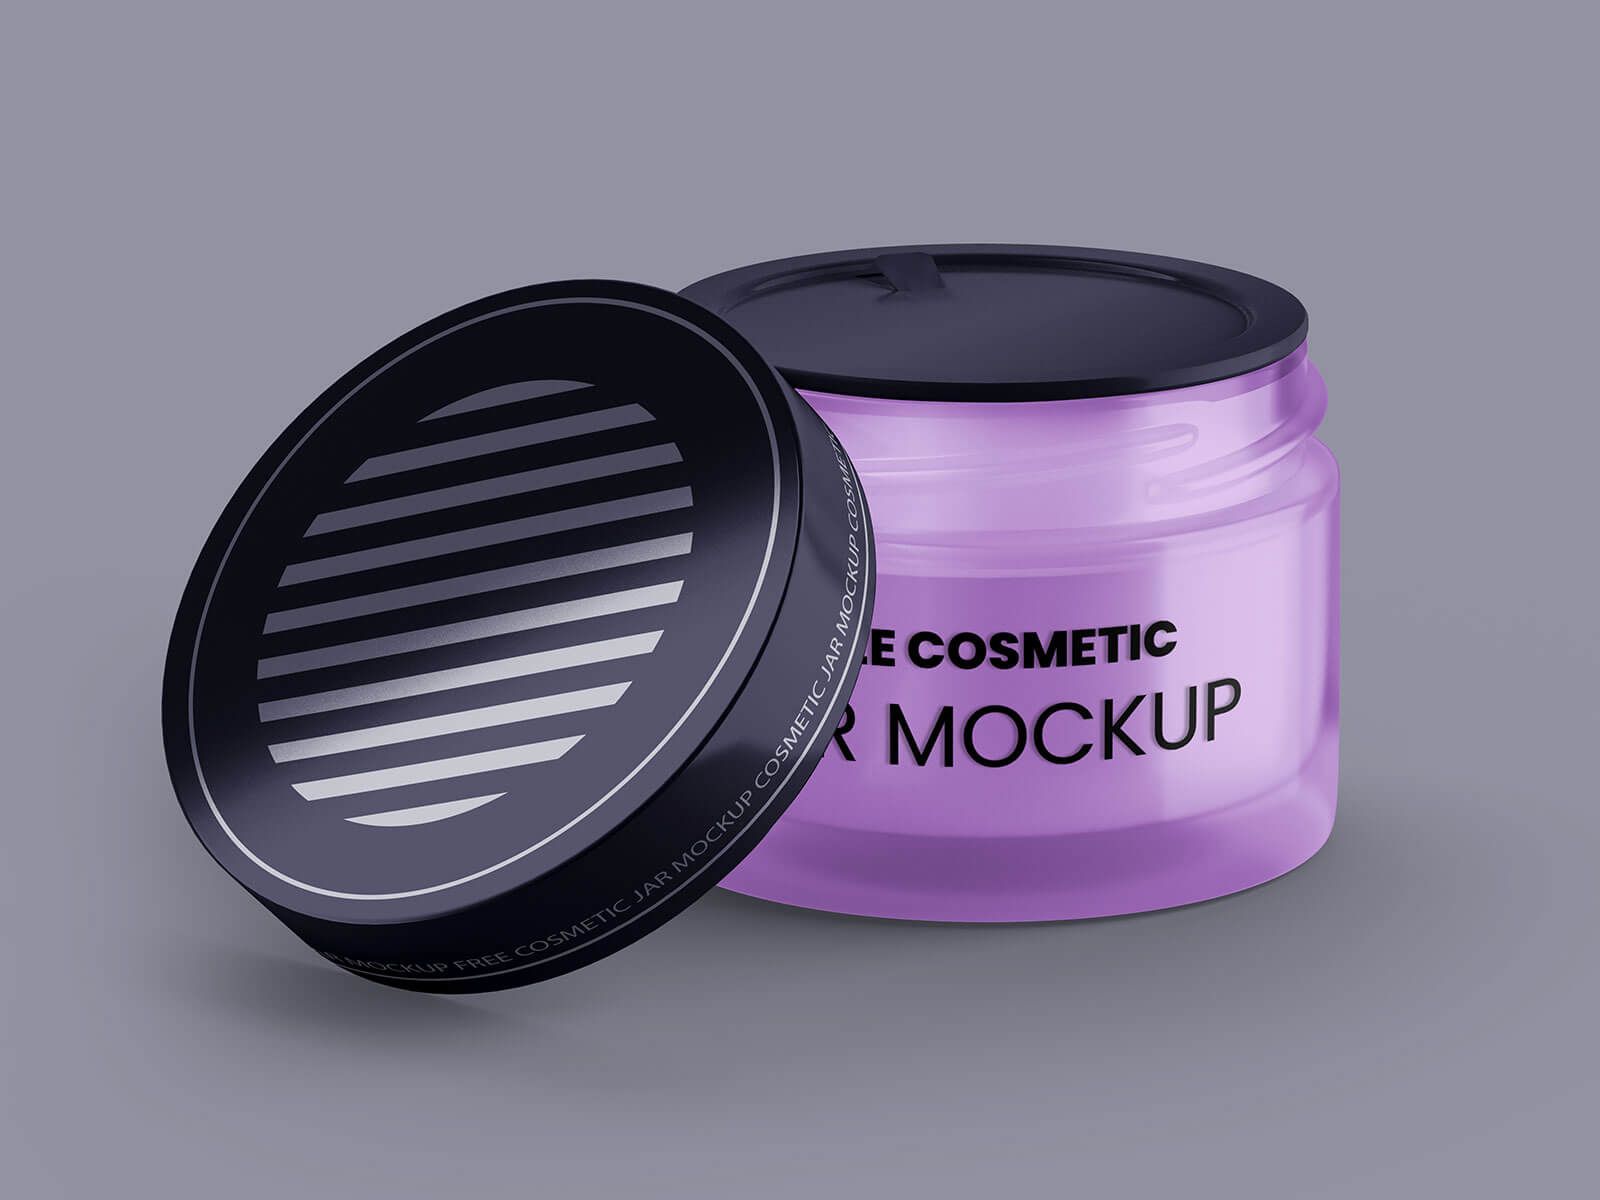 3 Free Glass Cosmetic Jar Mockup PSD Set (1)